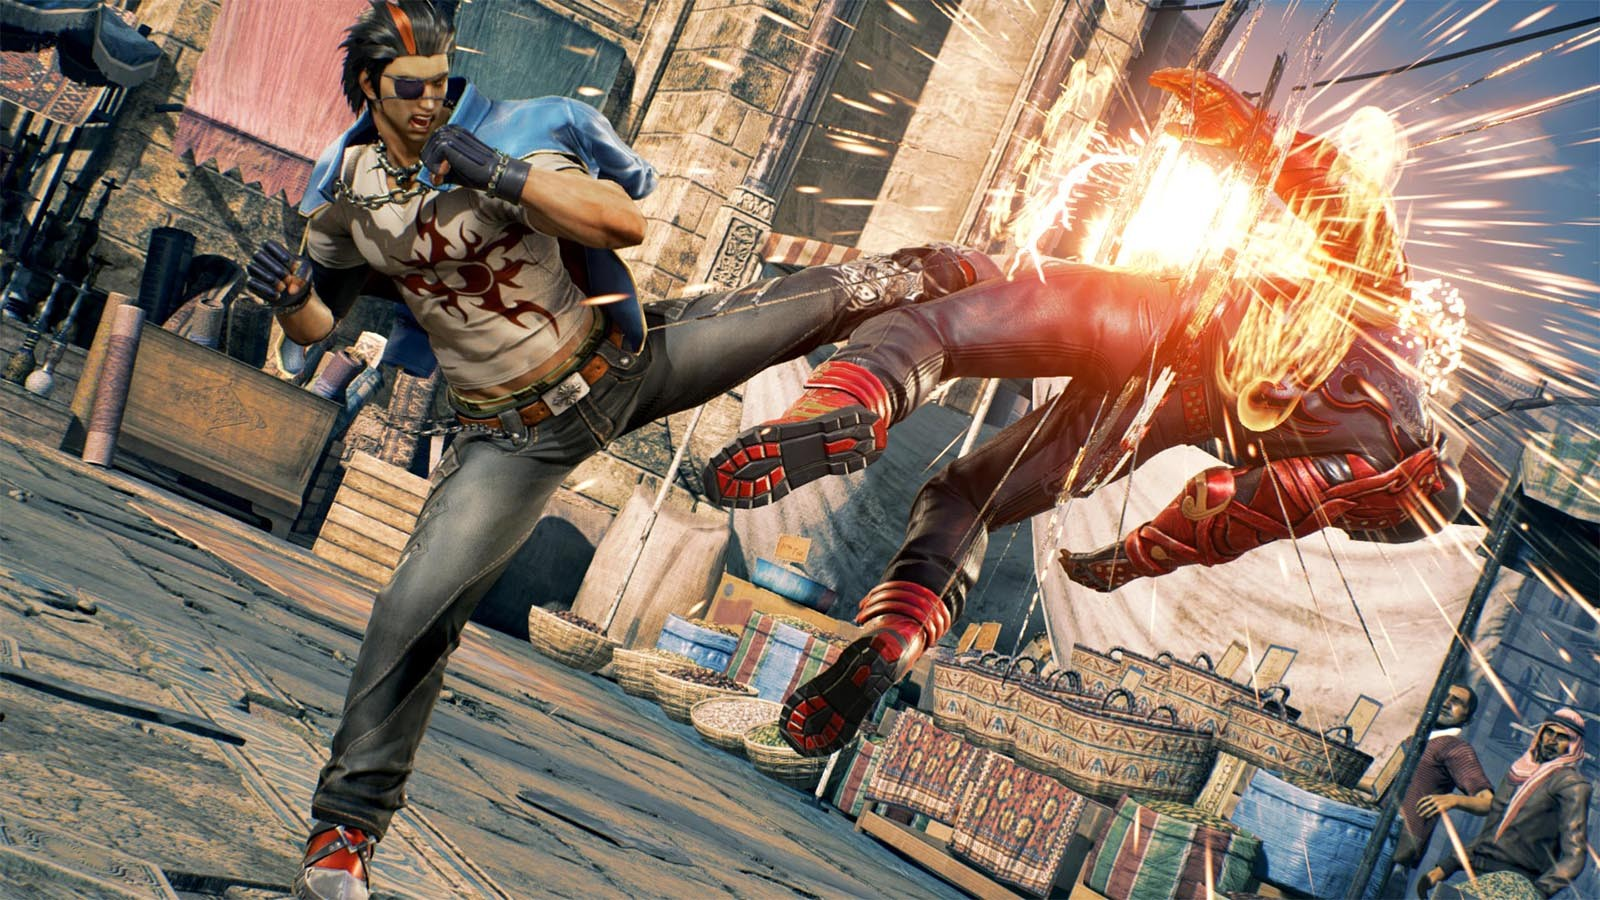 Tekken 7 celebrates its first anniversary with free DLC screenshot